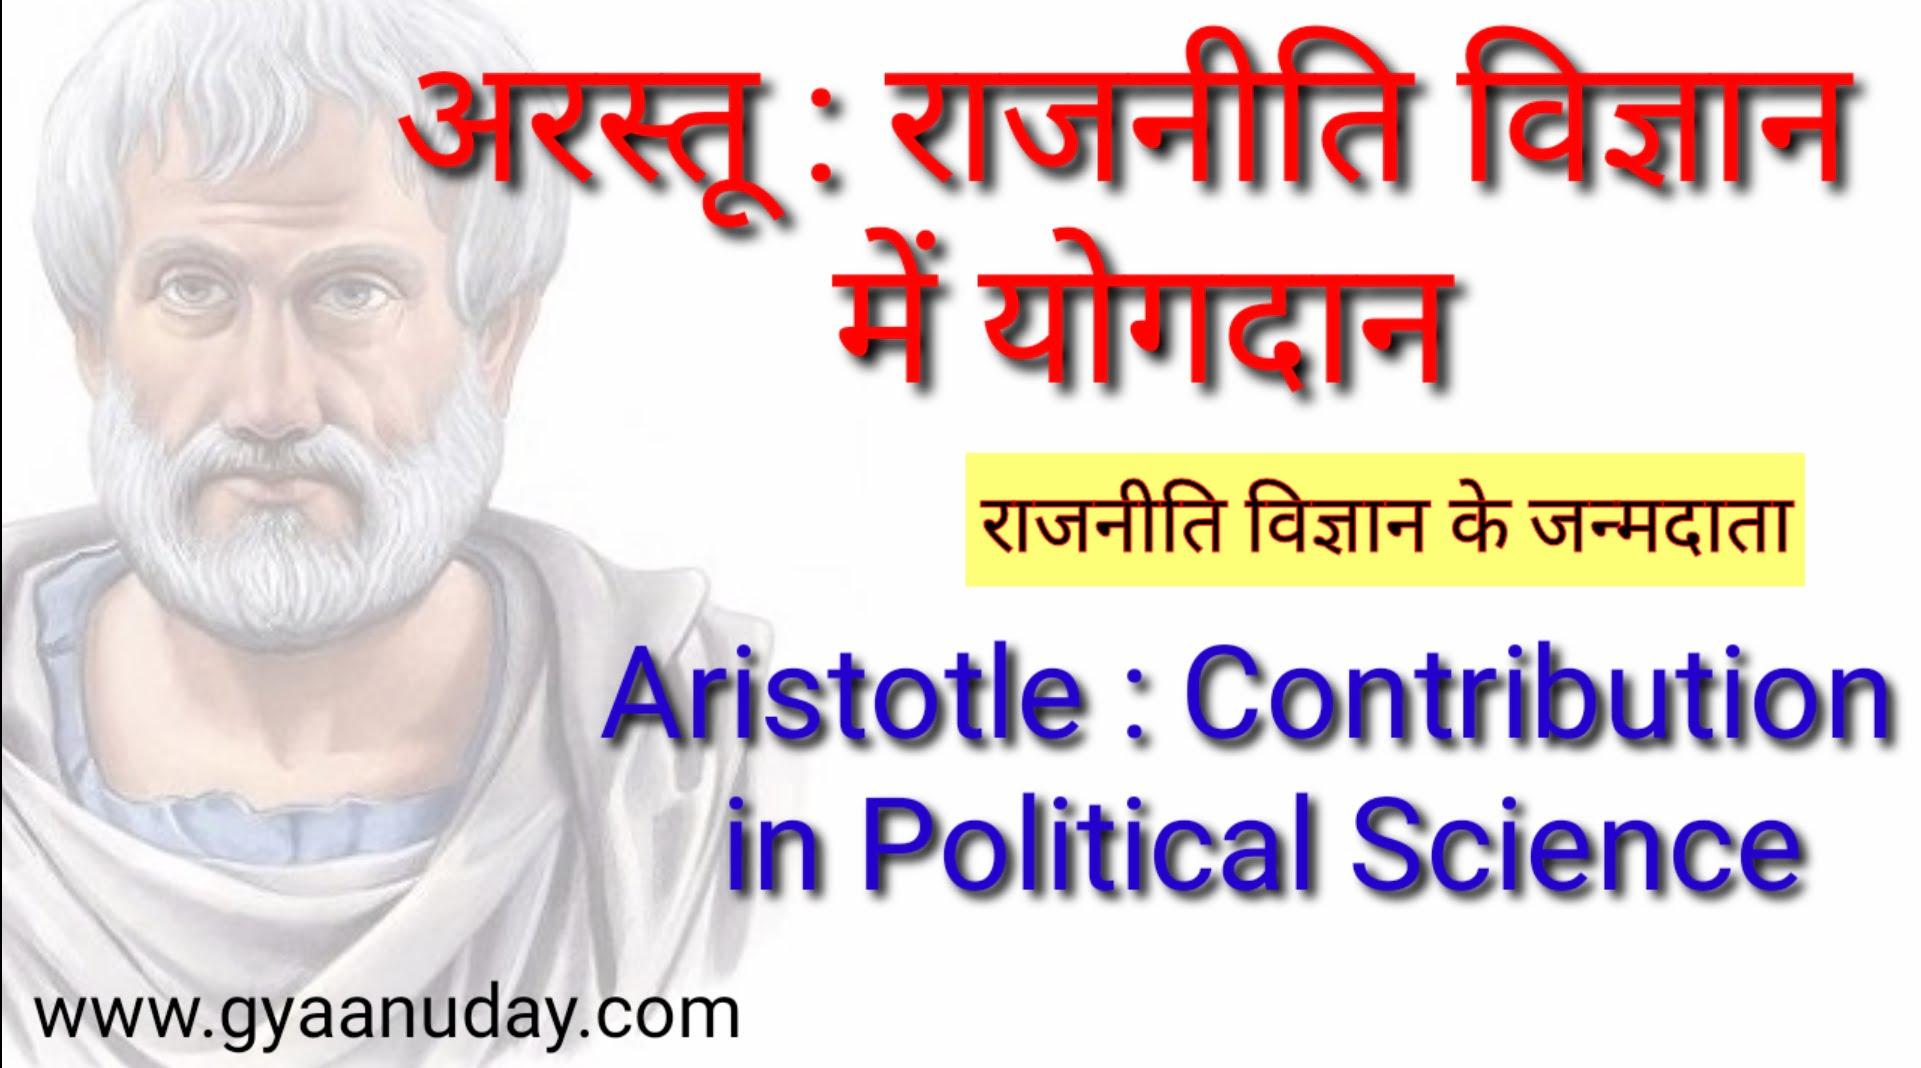 अरस्तू : राजनीति विज्ञान का जनक